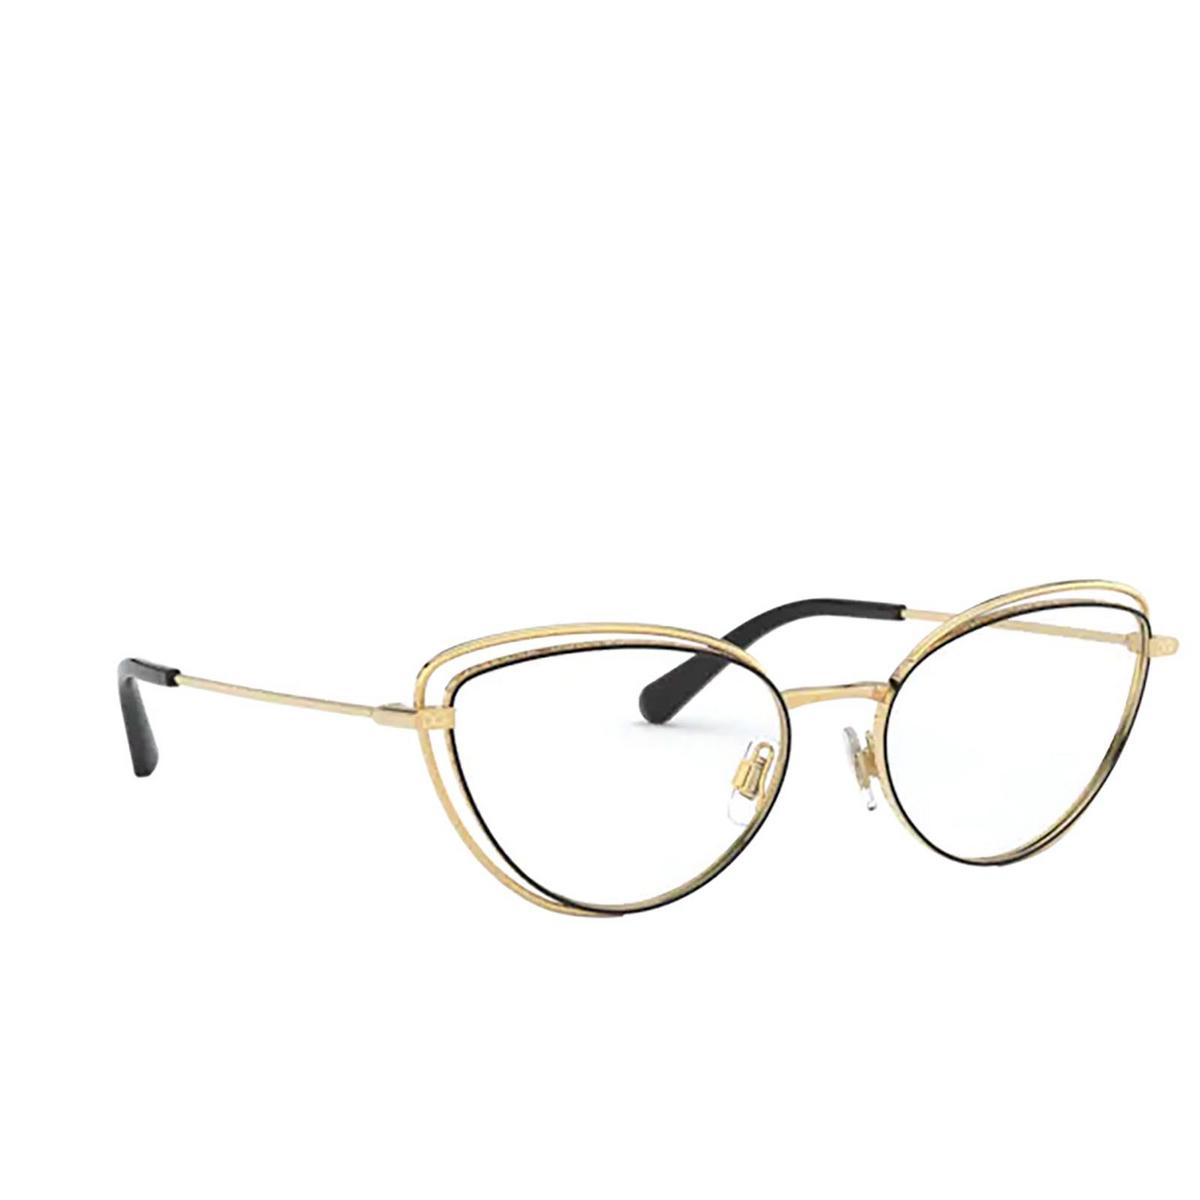 Dolce & Gabbana® Cat-eye Eyeglasses: DG1326 color Gold / Black 1334 - three-quarters view.